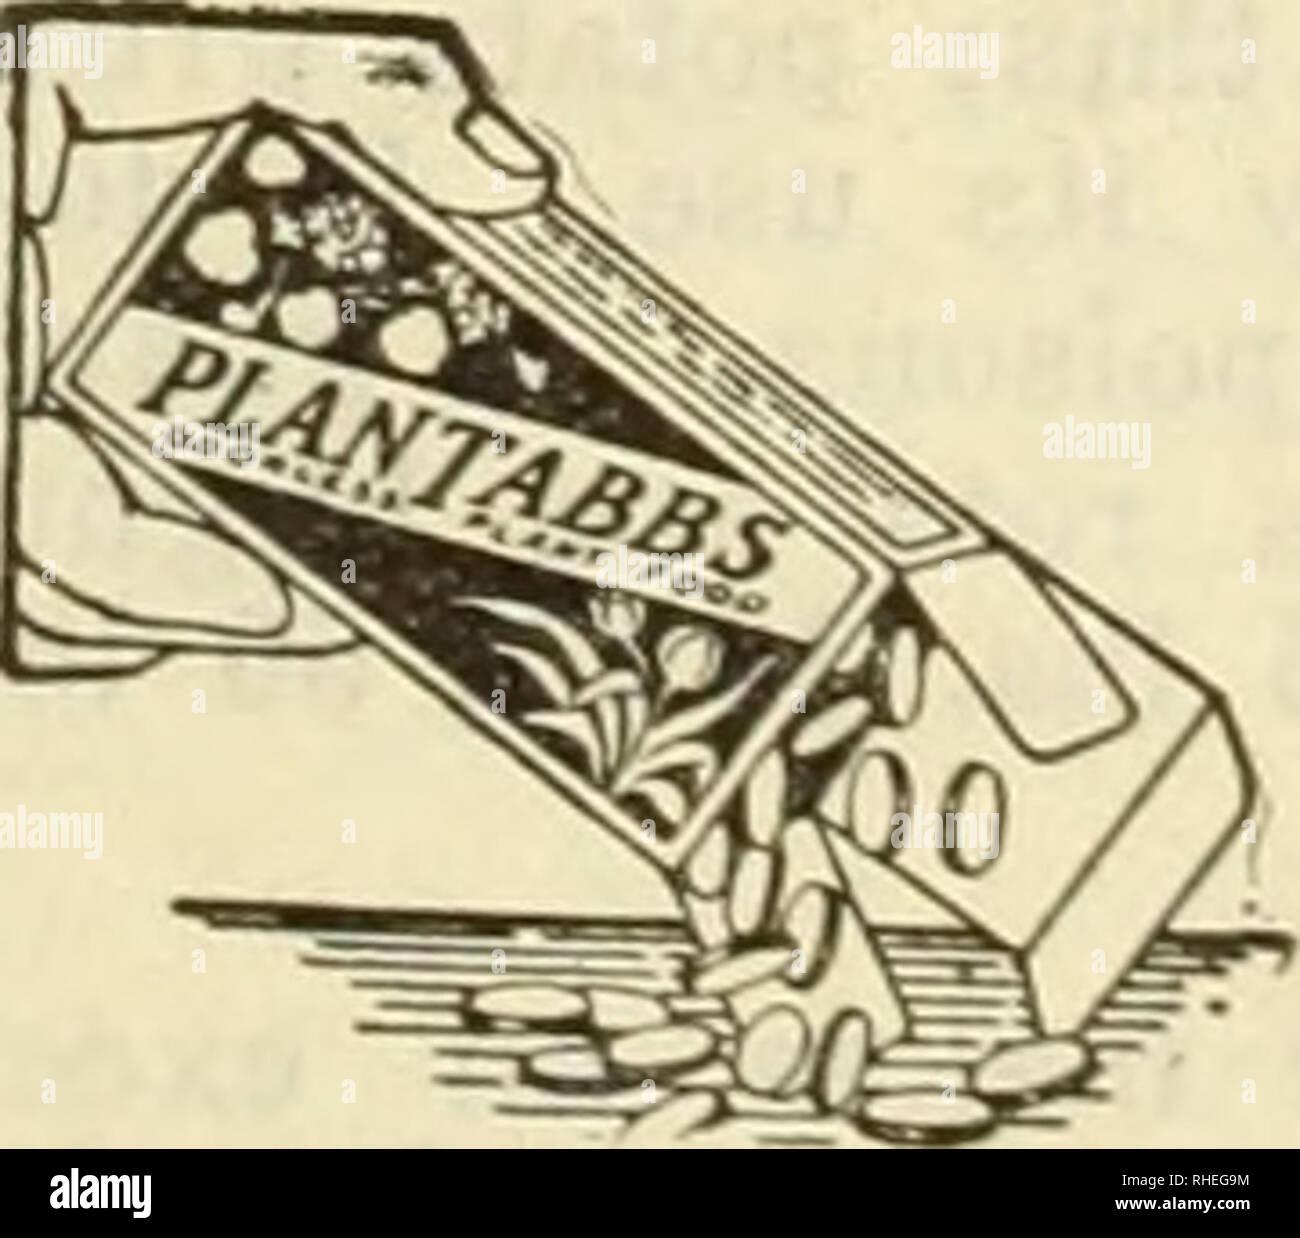 1bc5655398cc . Bolgiano s of Washington   new 1927 introduction the senator tomato.  Nurseries (Horticulture) Catalogs  Bulbs (Plants) Catalogs  Vegetables  Catalogs  ...